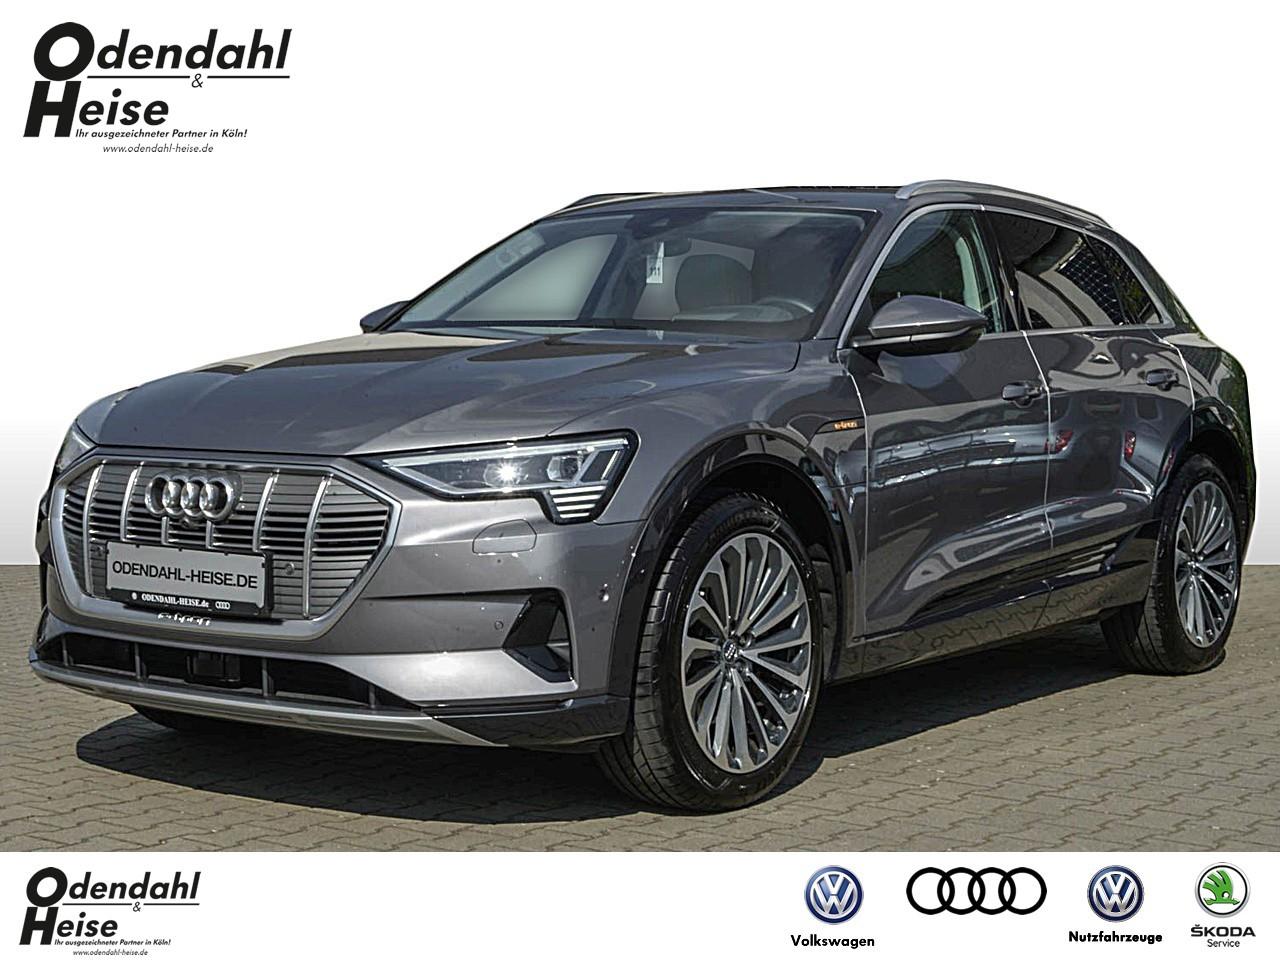 Audi e-tron advanced 55 quattro 300 kW Klima Navi, Jahr 2019, Elektro